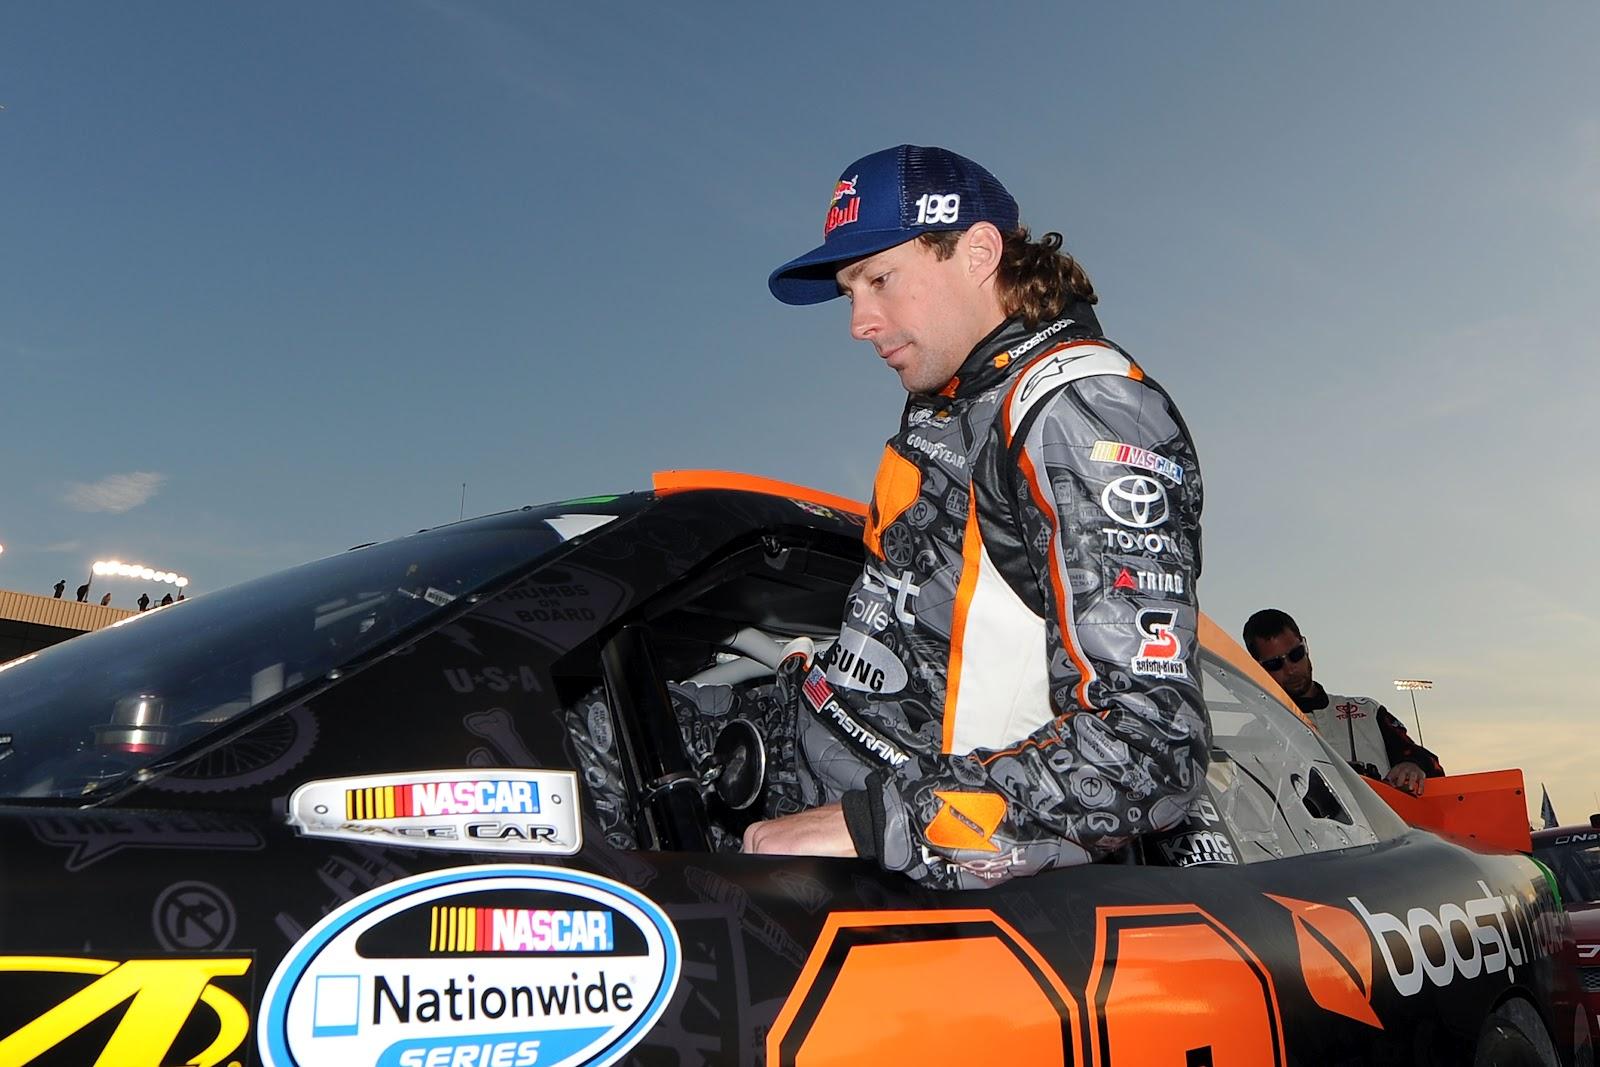 Nascar Is Travis Pastrana Better Than Danica Patrick: Auto Racing 2012: Danica Mania, Part II